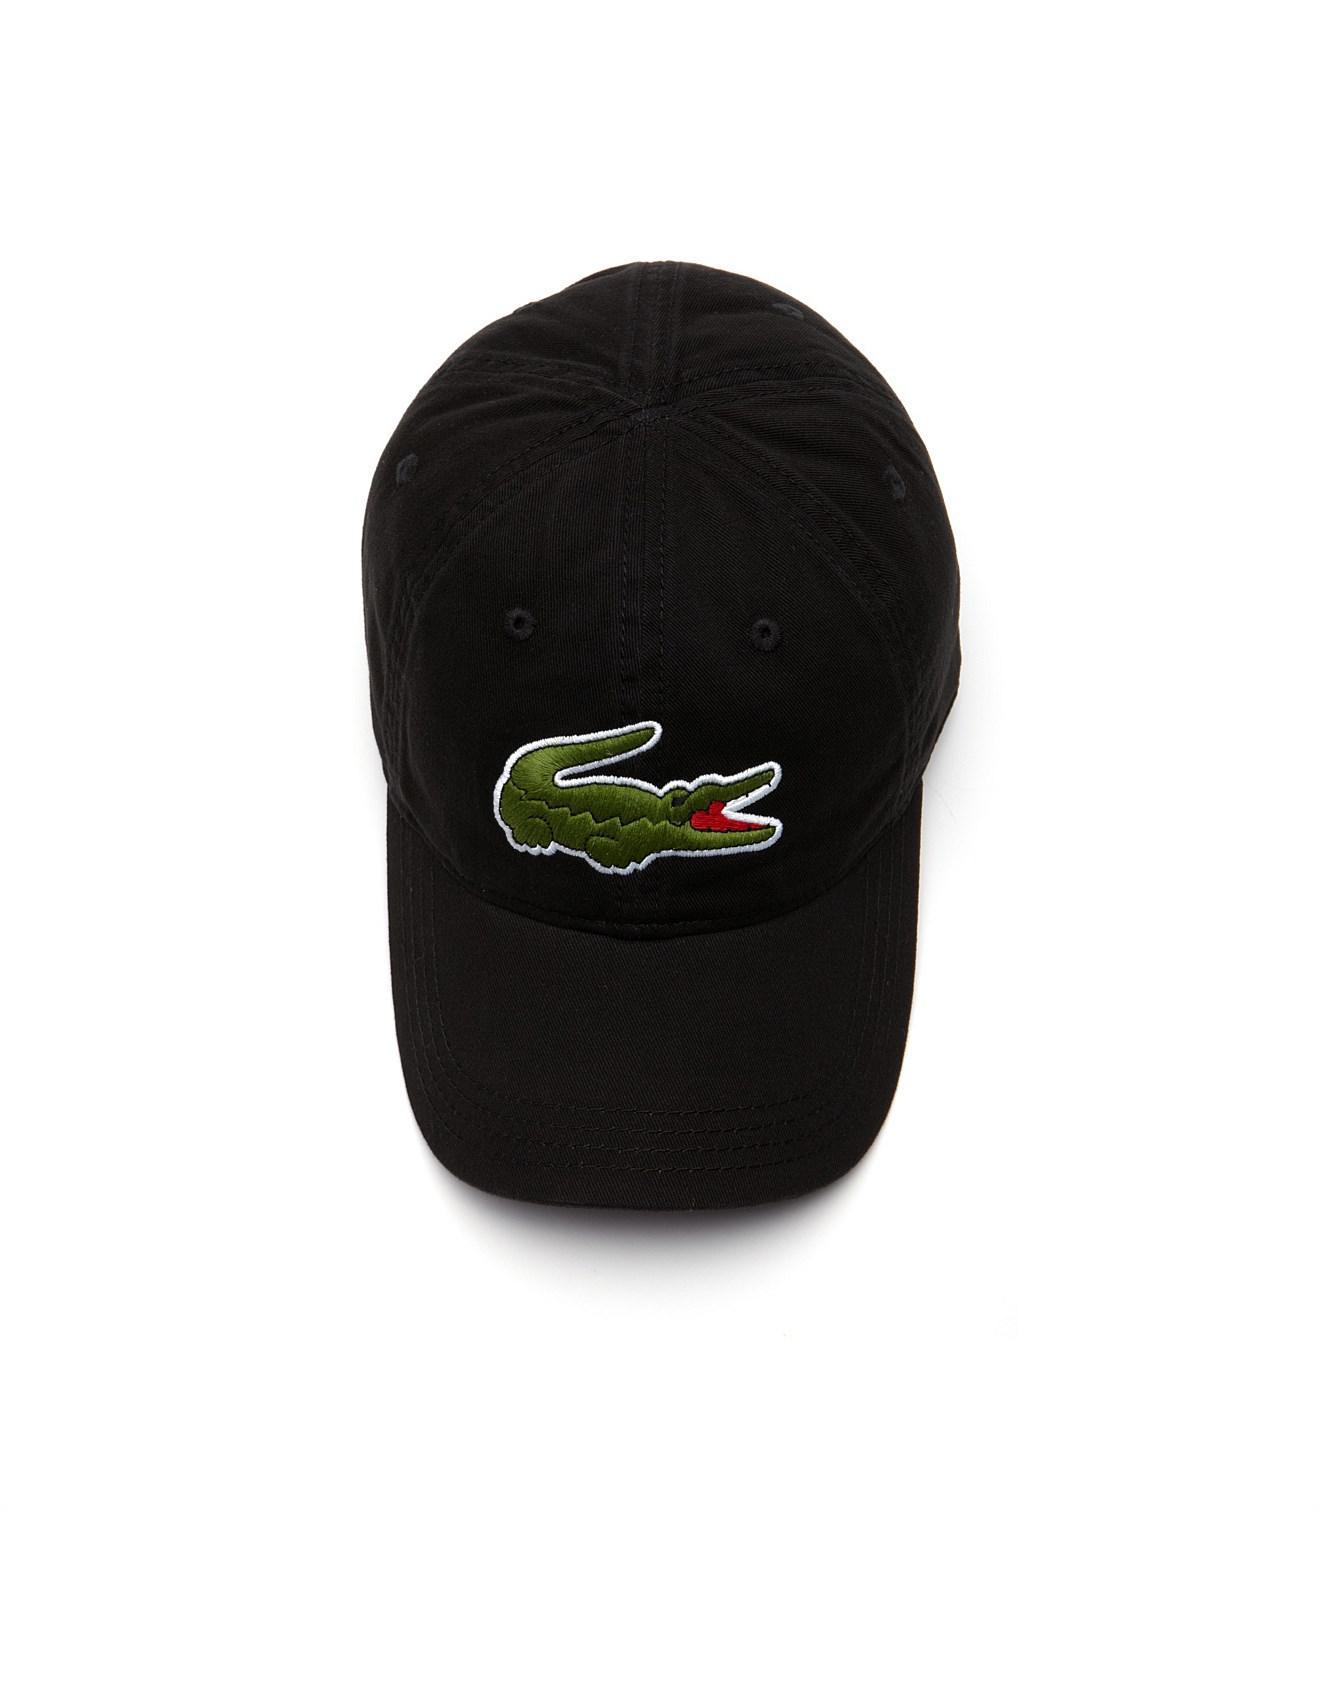 603468eeb8e1 Lacoste Large Croc Cap in Black for Men - Save 30% - Lyst